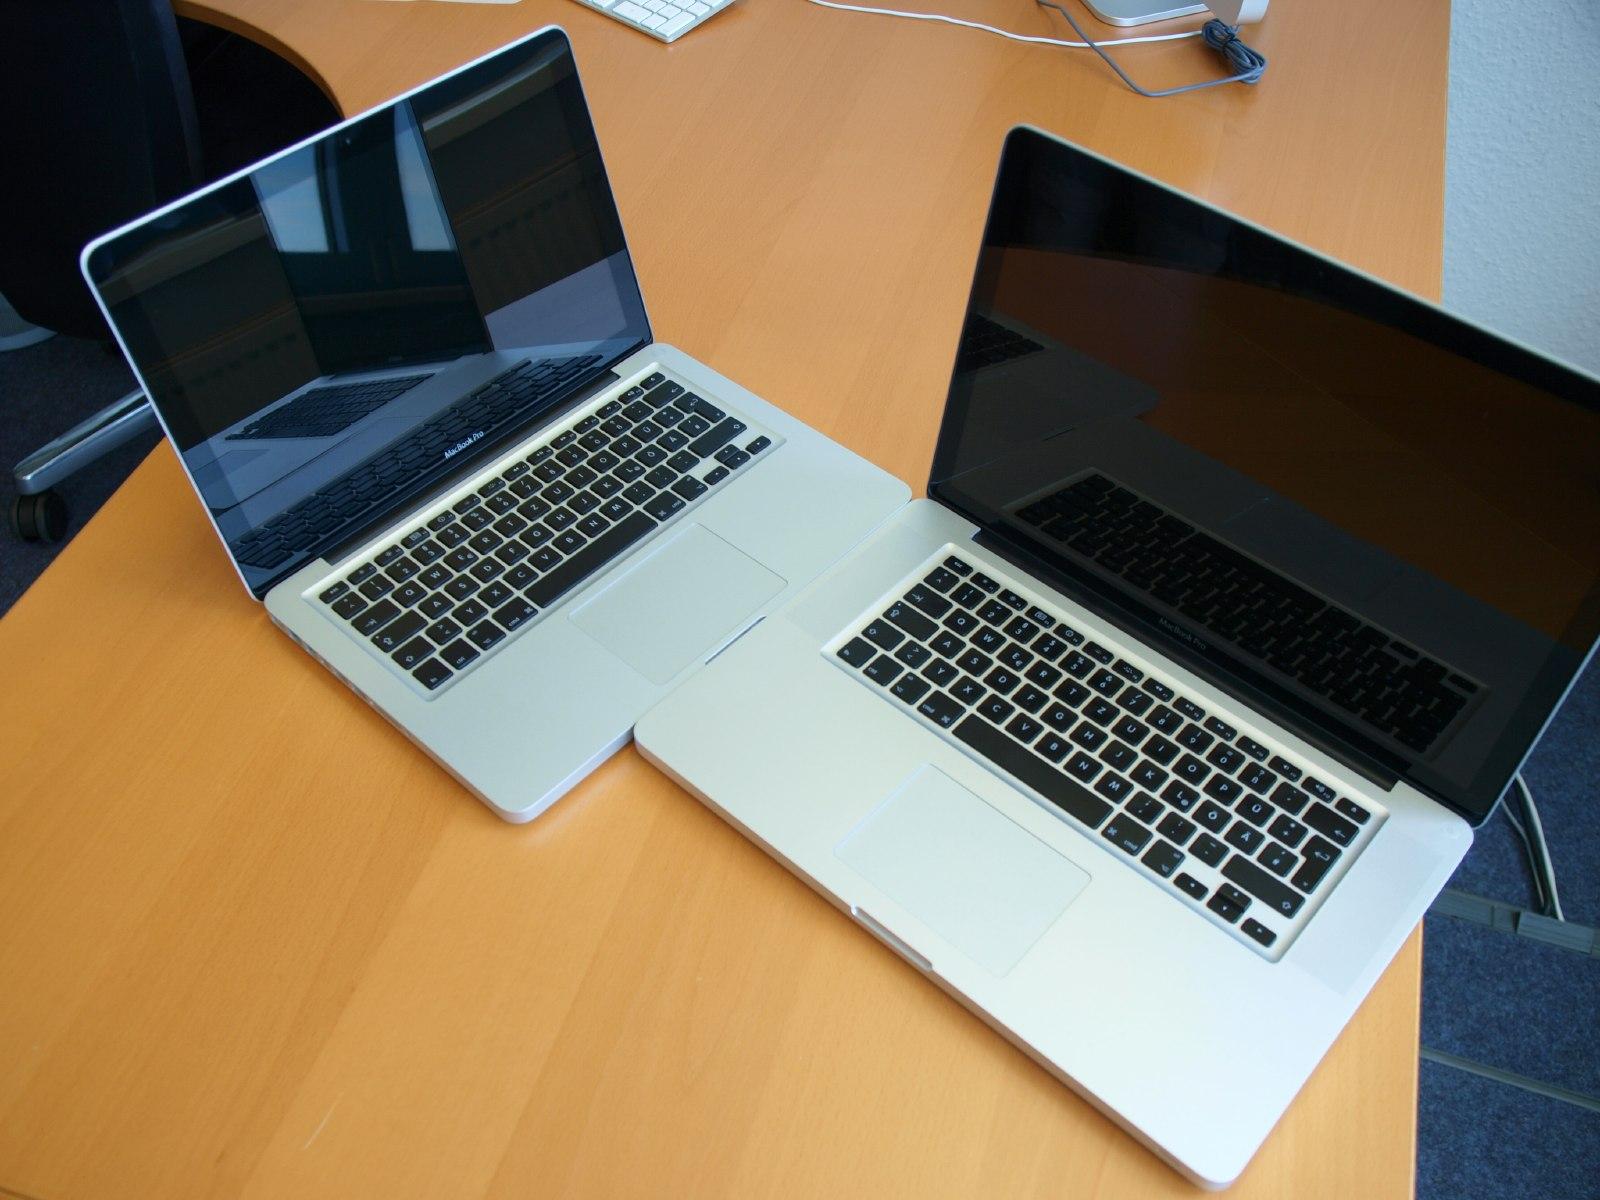 macbook pro 13 zoll und macbook pro 15 zoll news. Black Bedroom Furniture Sets. Home Design Ideas